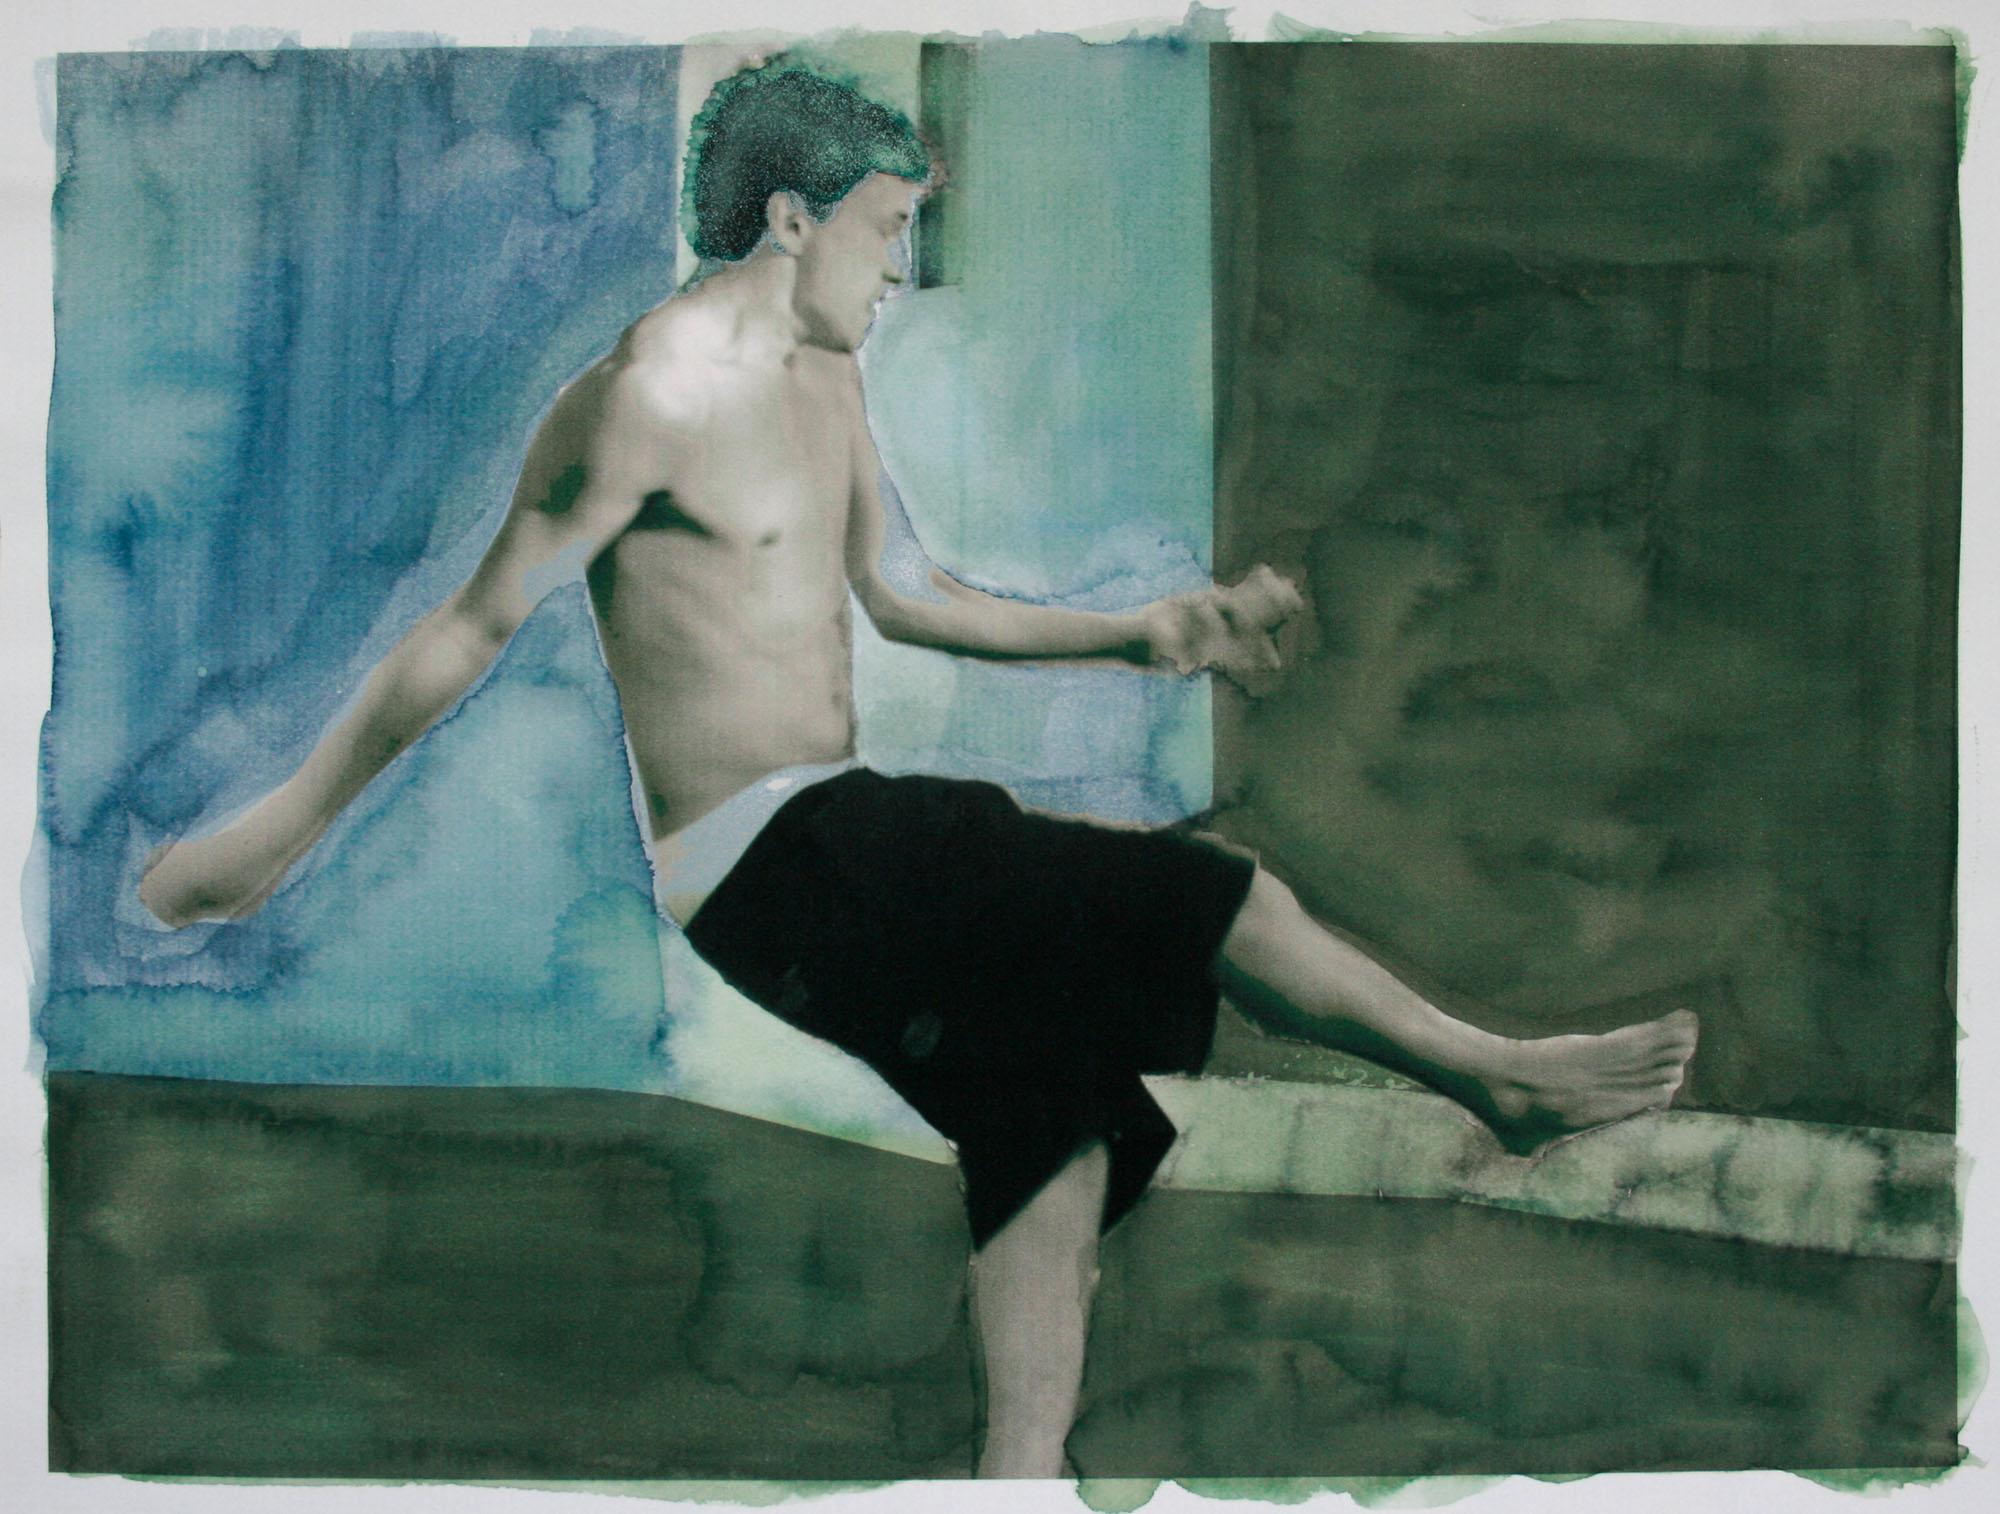 2009 - Lucas Azul